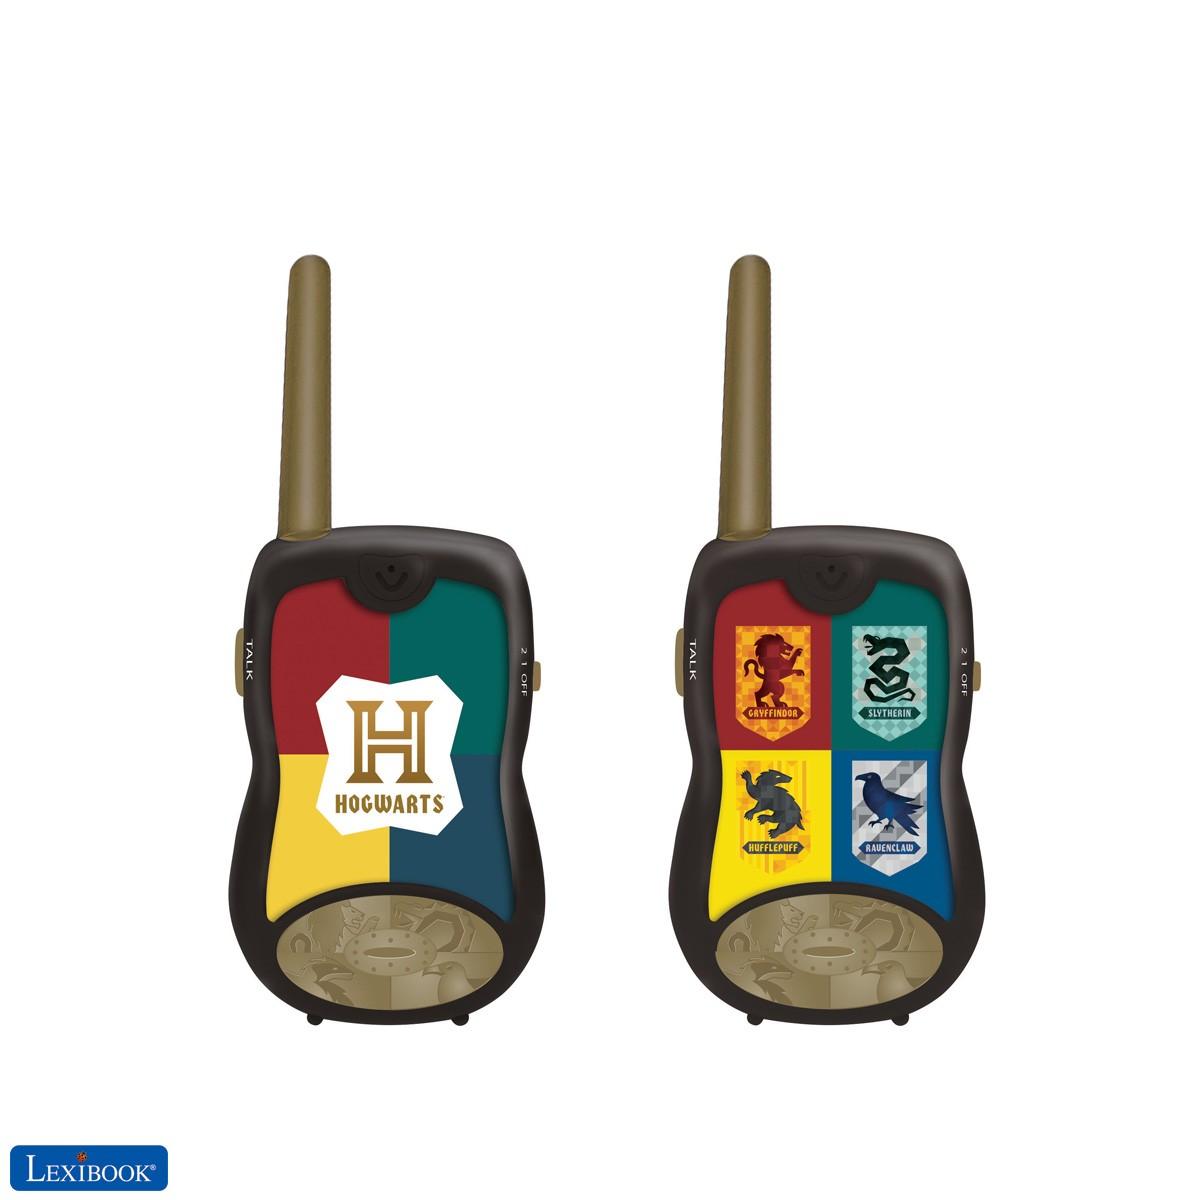 Warner Harry Potter Walkie-Talkies